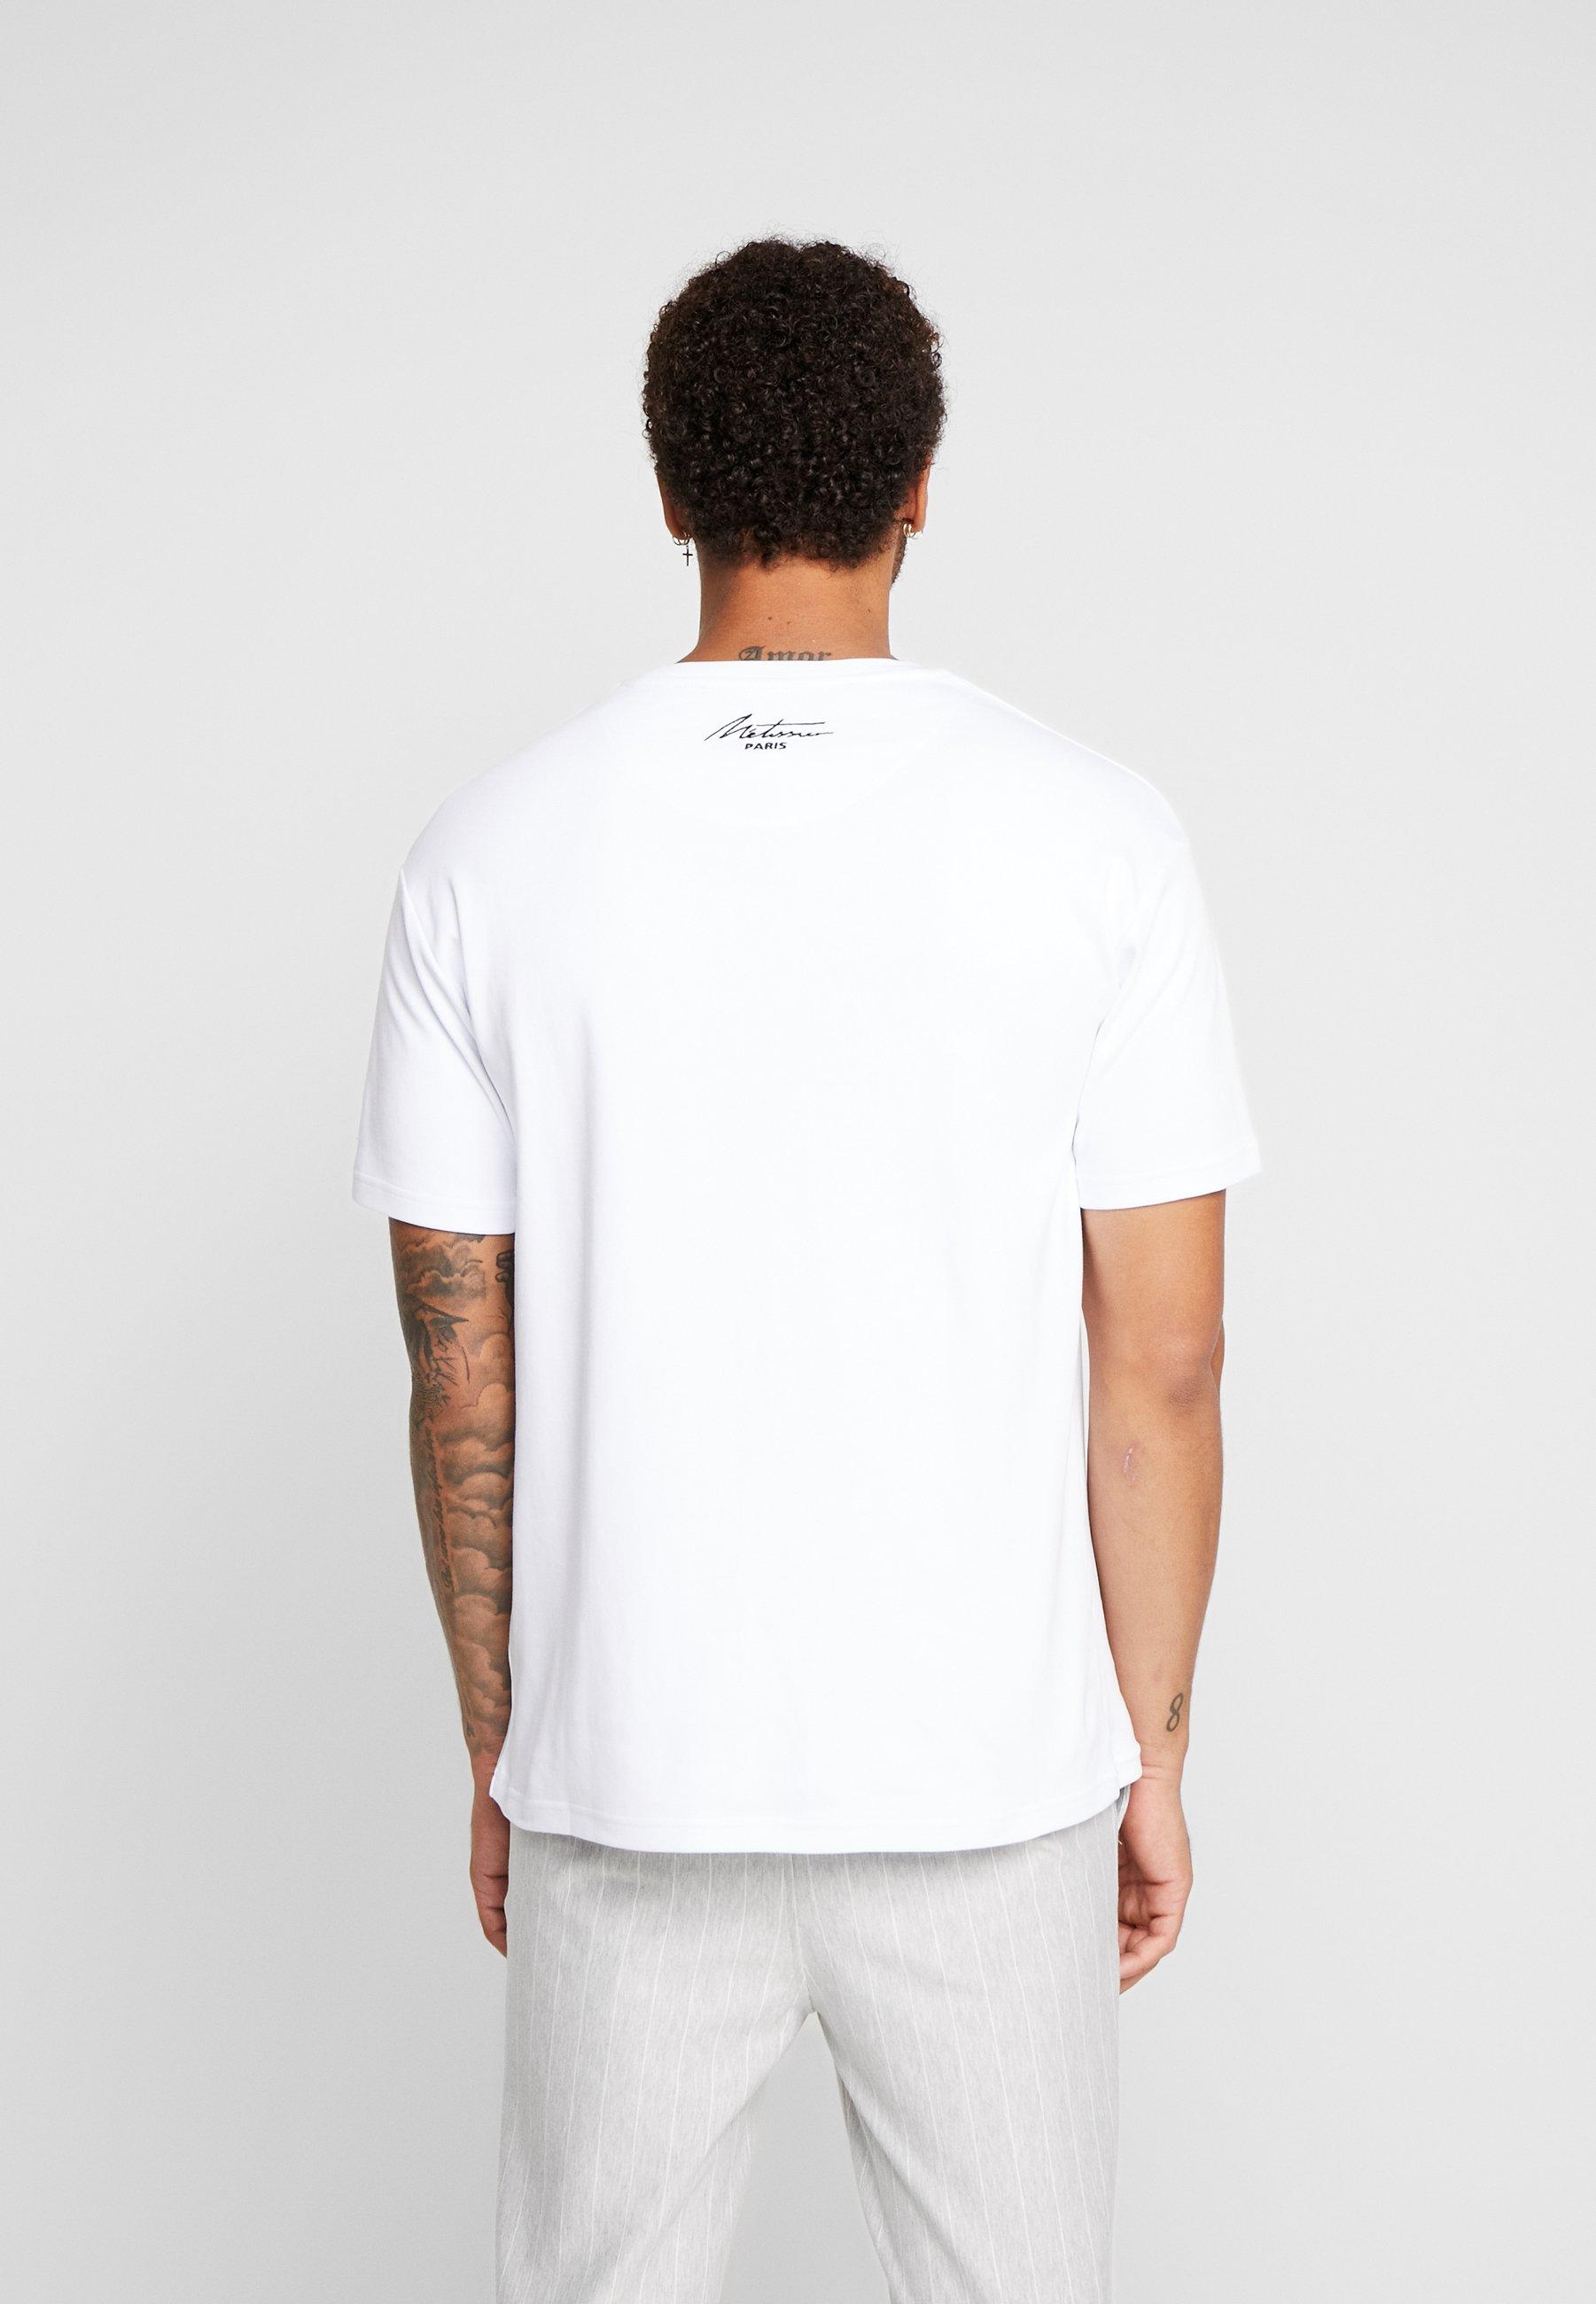 ARDO WITH SIGNATURE LOGO T shirt print white